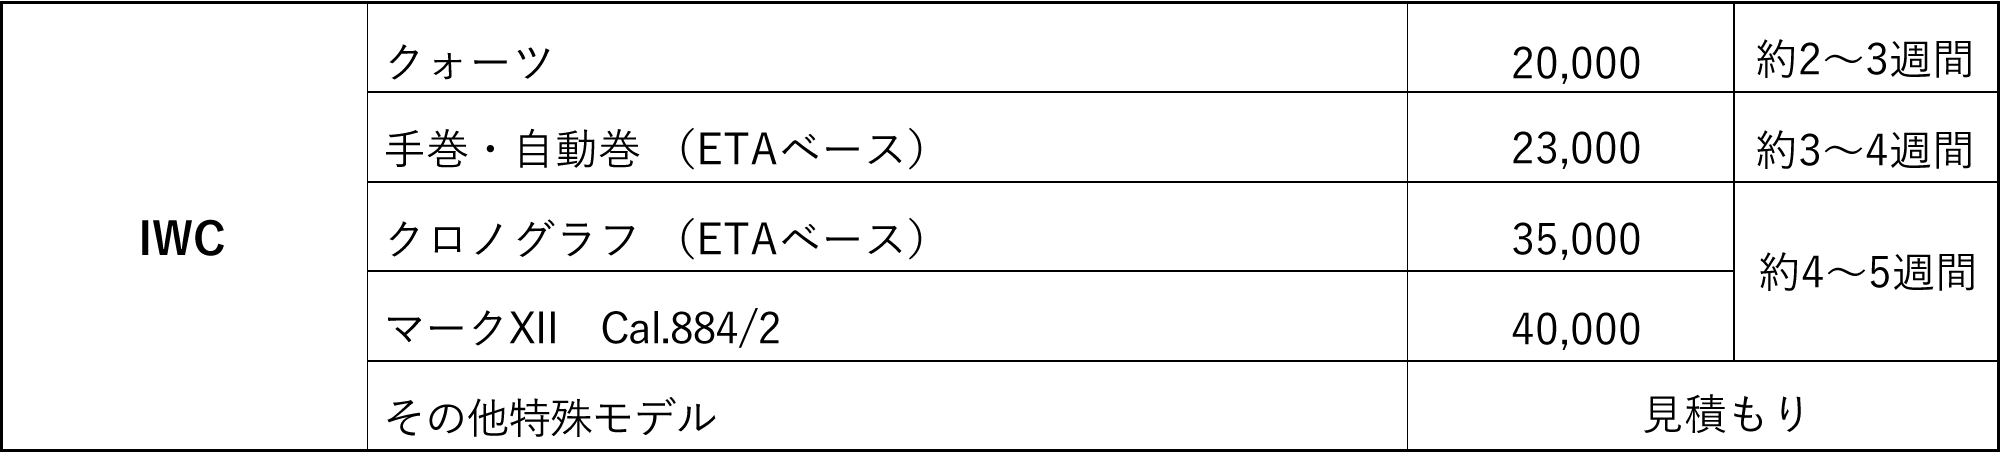 IWC オーバーホール料金表